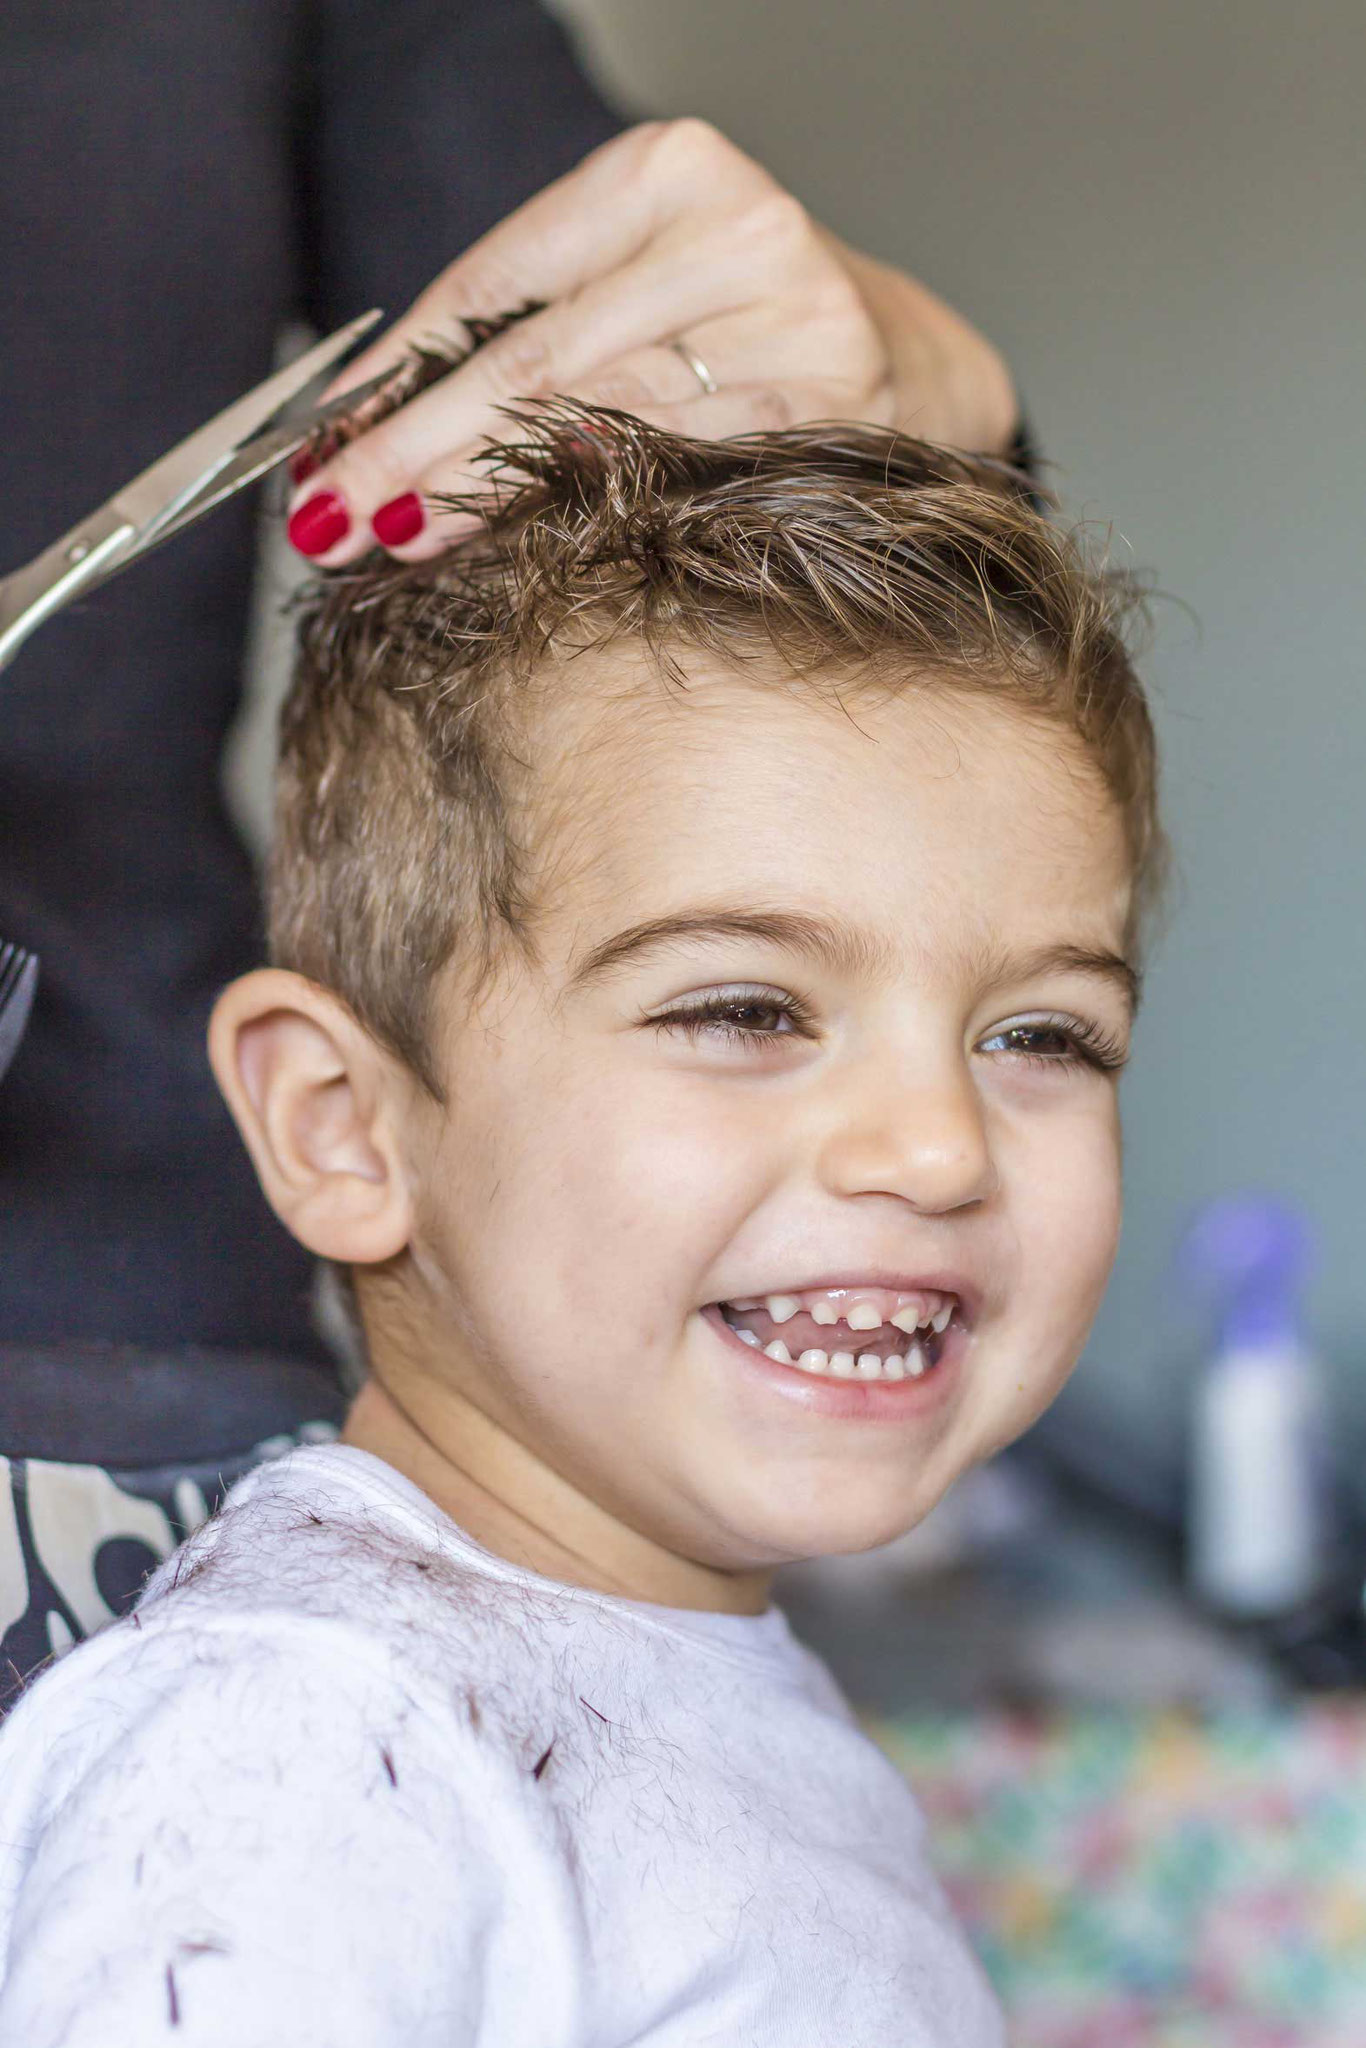 Haarschnitt Boys